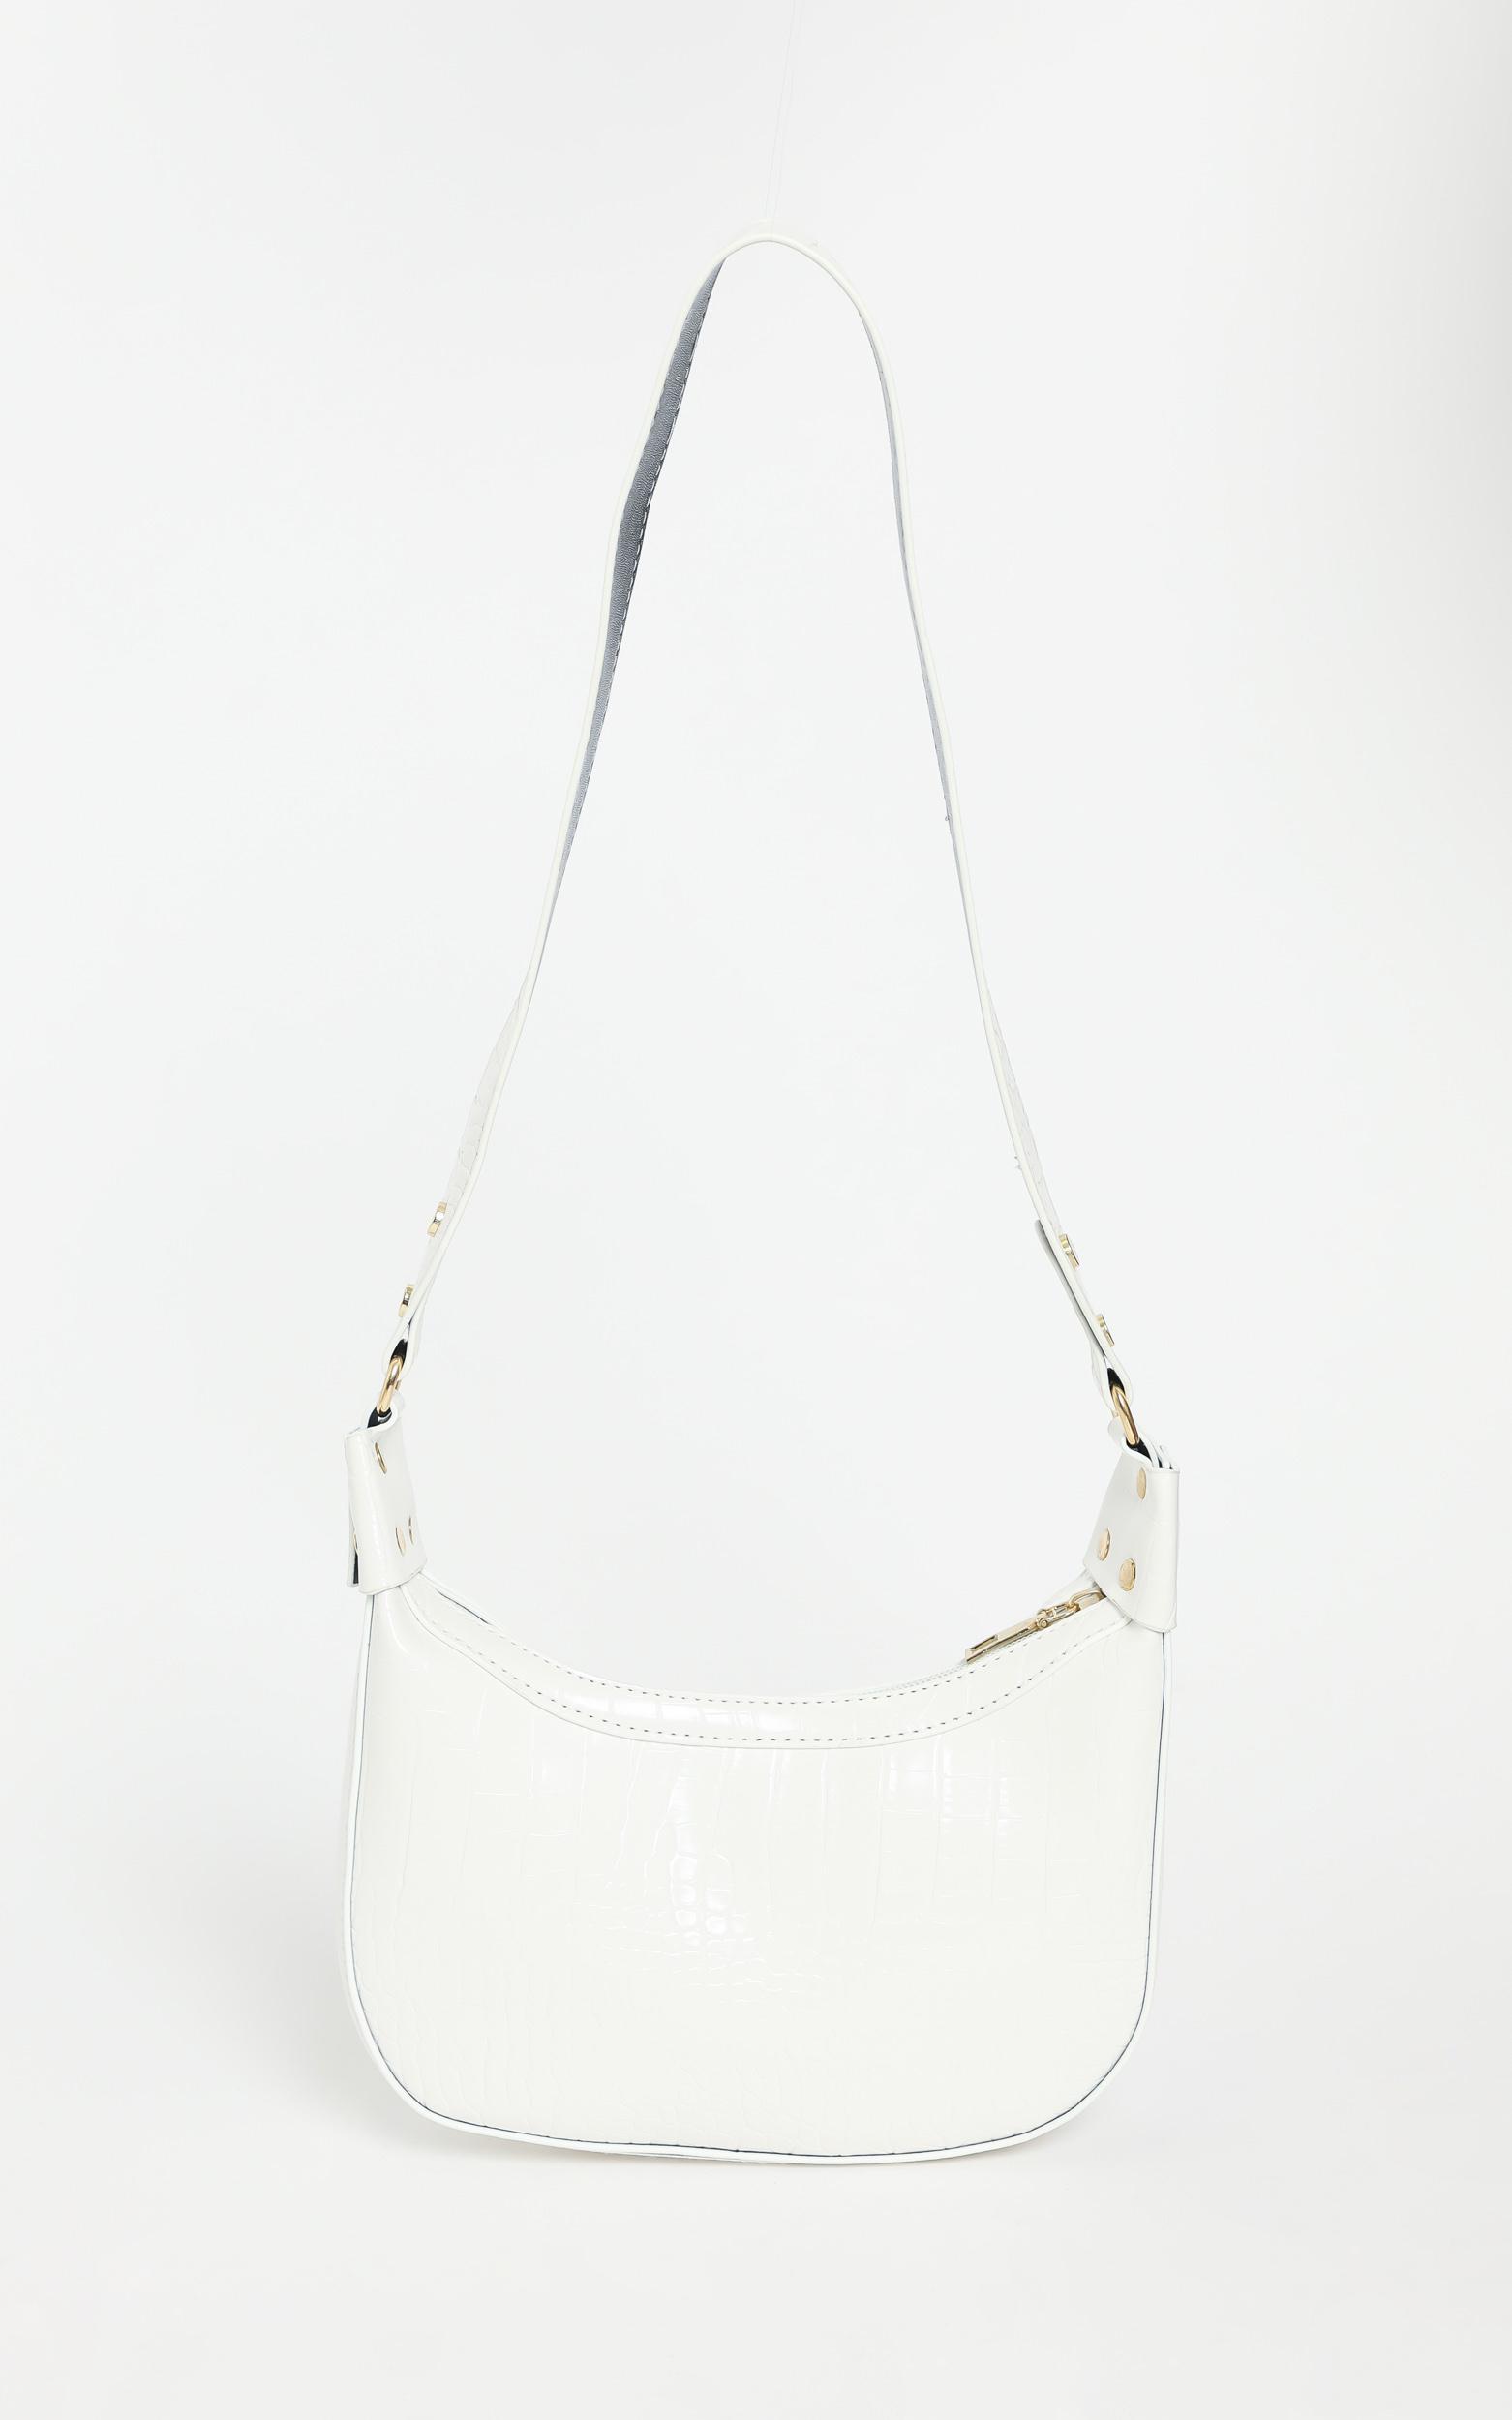 Sarai Bag in White, , hi-res image number null